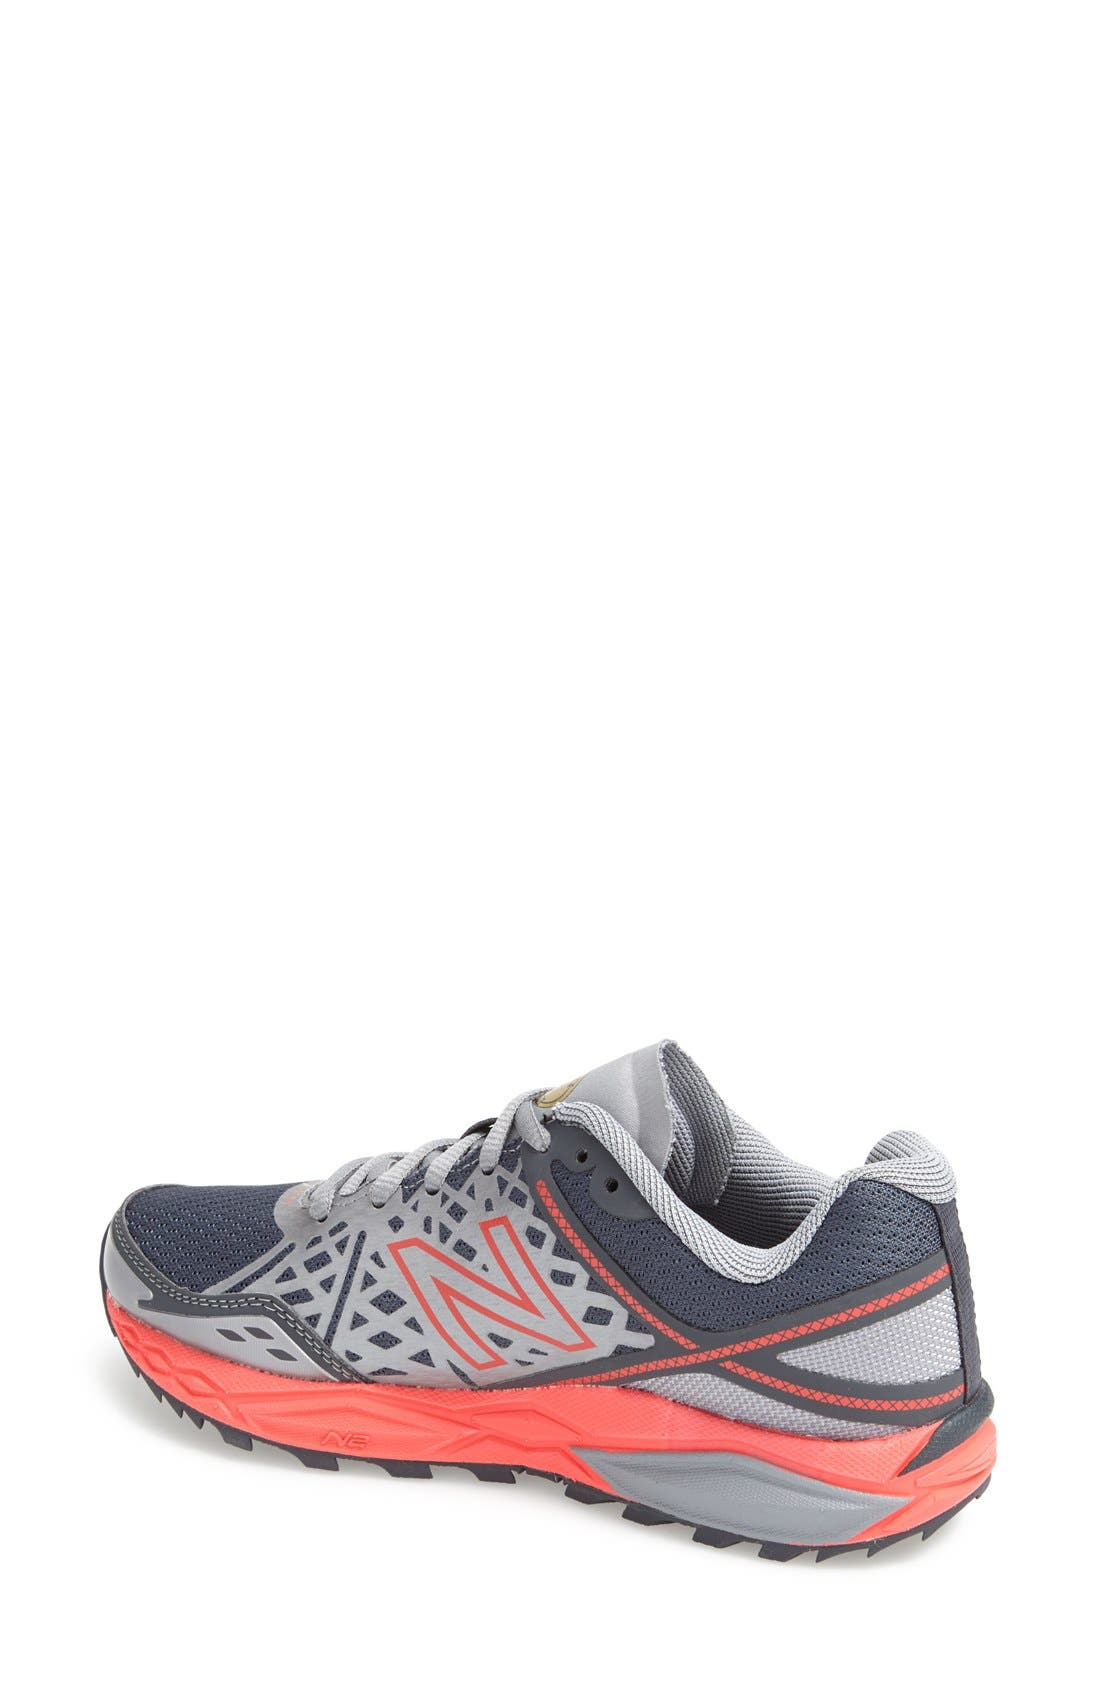 Alternate Image 2  - New Balance '1210' Trail Running Shoe (Women)